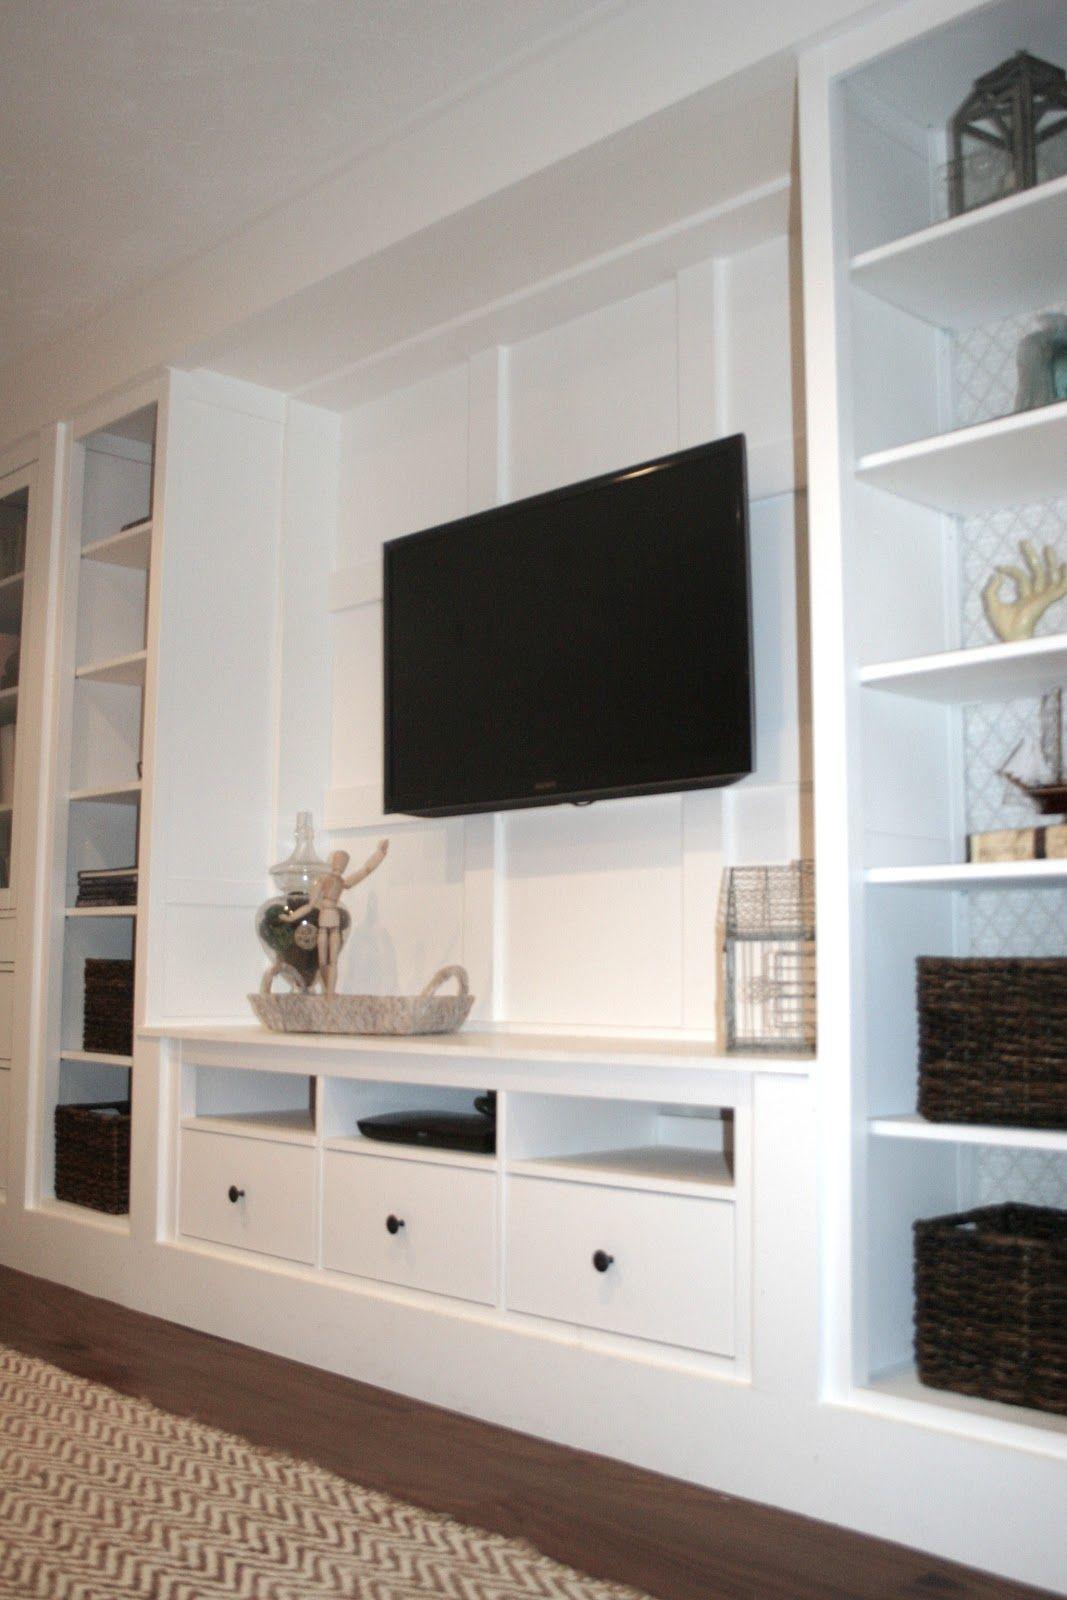 Basement Update Tour Home Living Room Basement Updating Tv